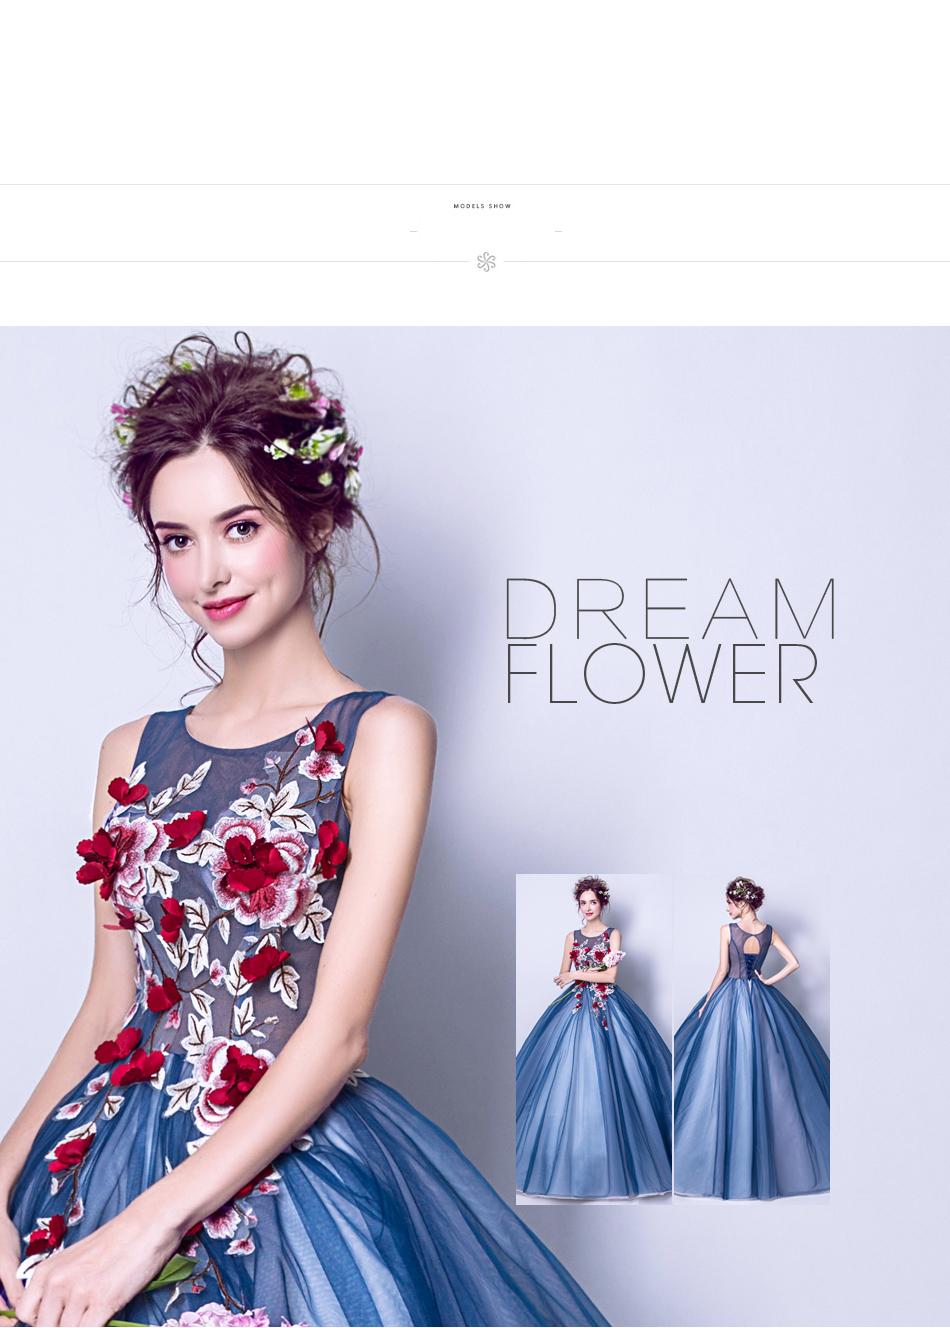 Angel Wedding Dress Marriage Evening Bride Party Prom Bridal Gown Vestido De Noiva Blue camouflage, fantasy flowers 2017 7572 5